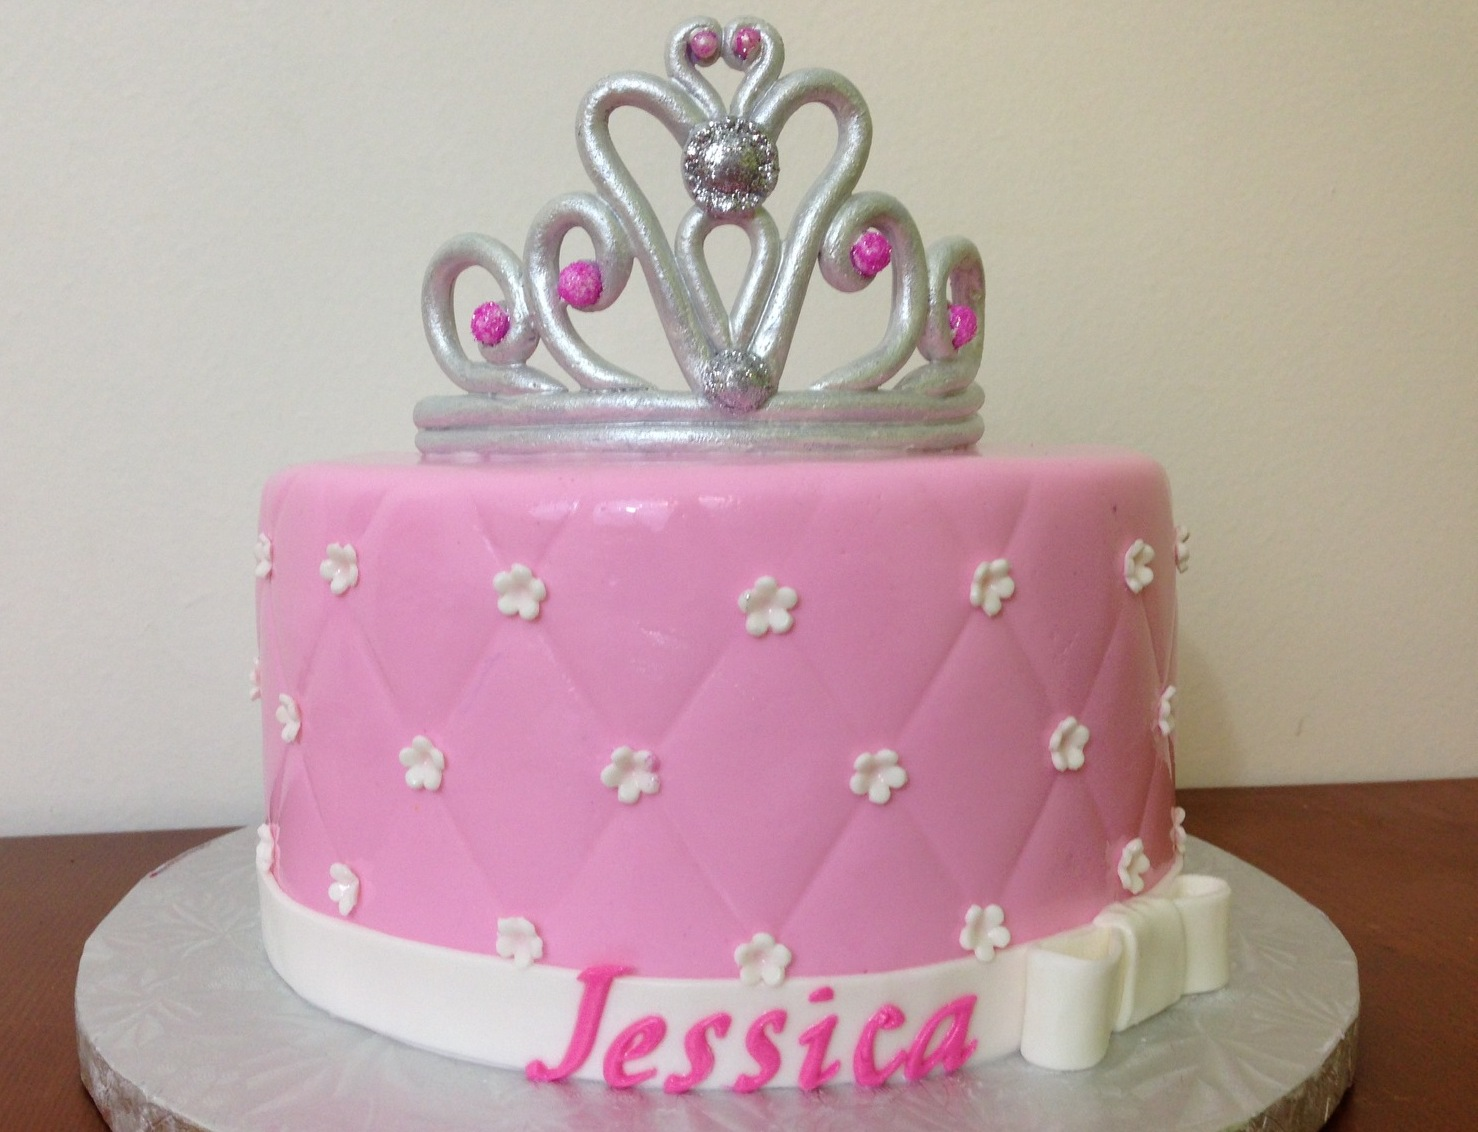 Brilliant Happy Birthday Jessica Cakalicious Cakes Funny Birthday Cards Online Alyptdamsfinfo